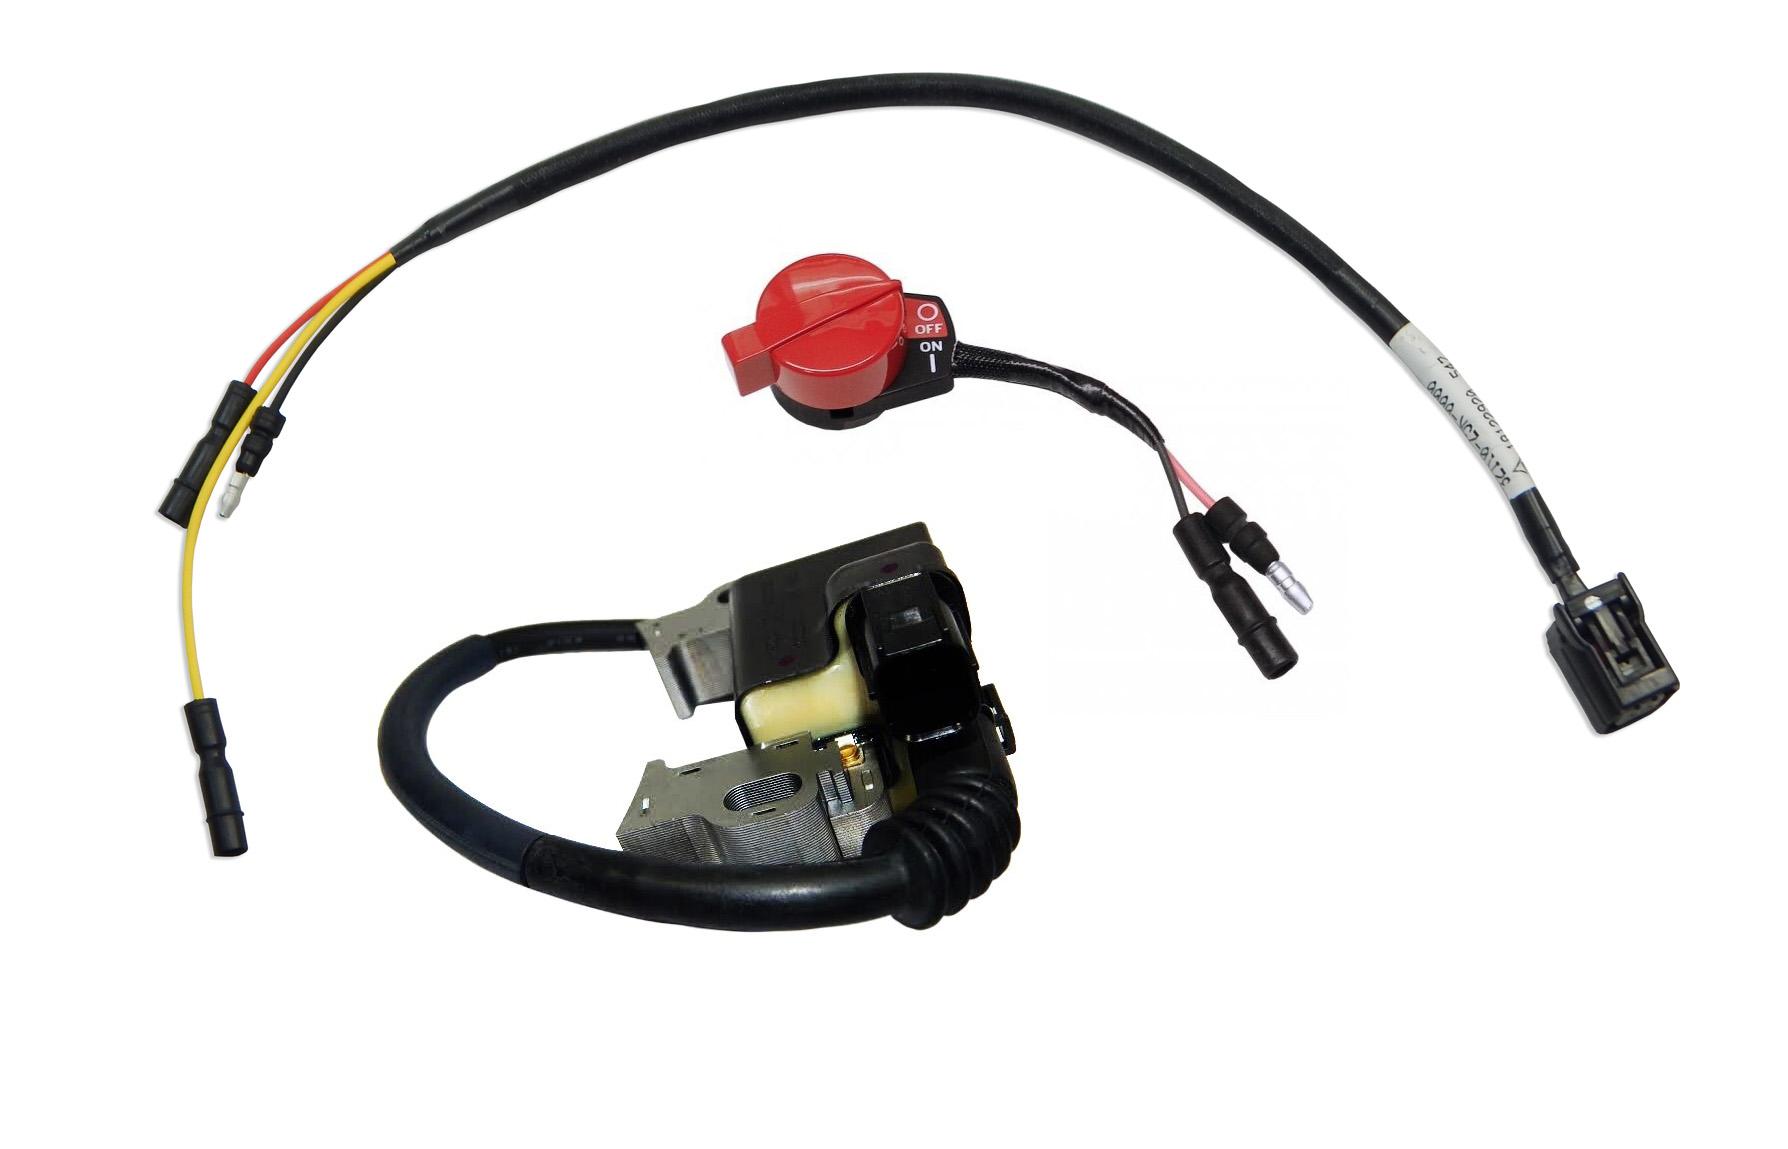 Genuine Honda 54205-SH3-971 Wire Harness Clamp